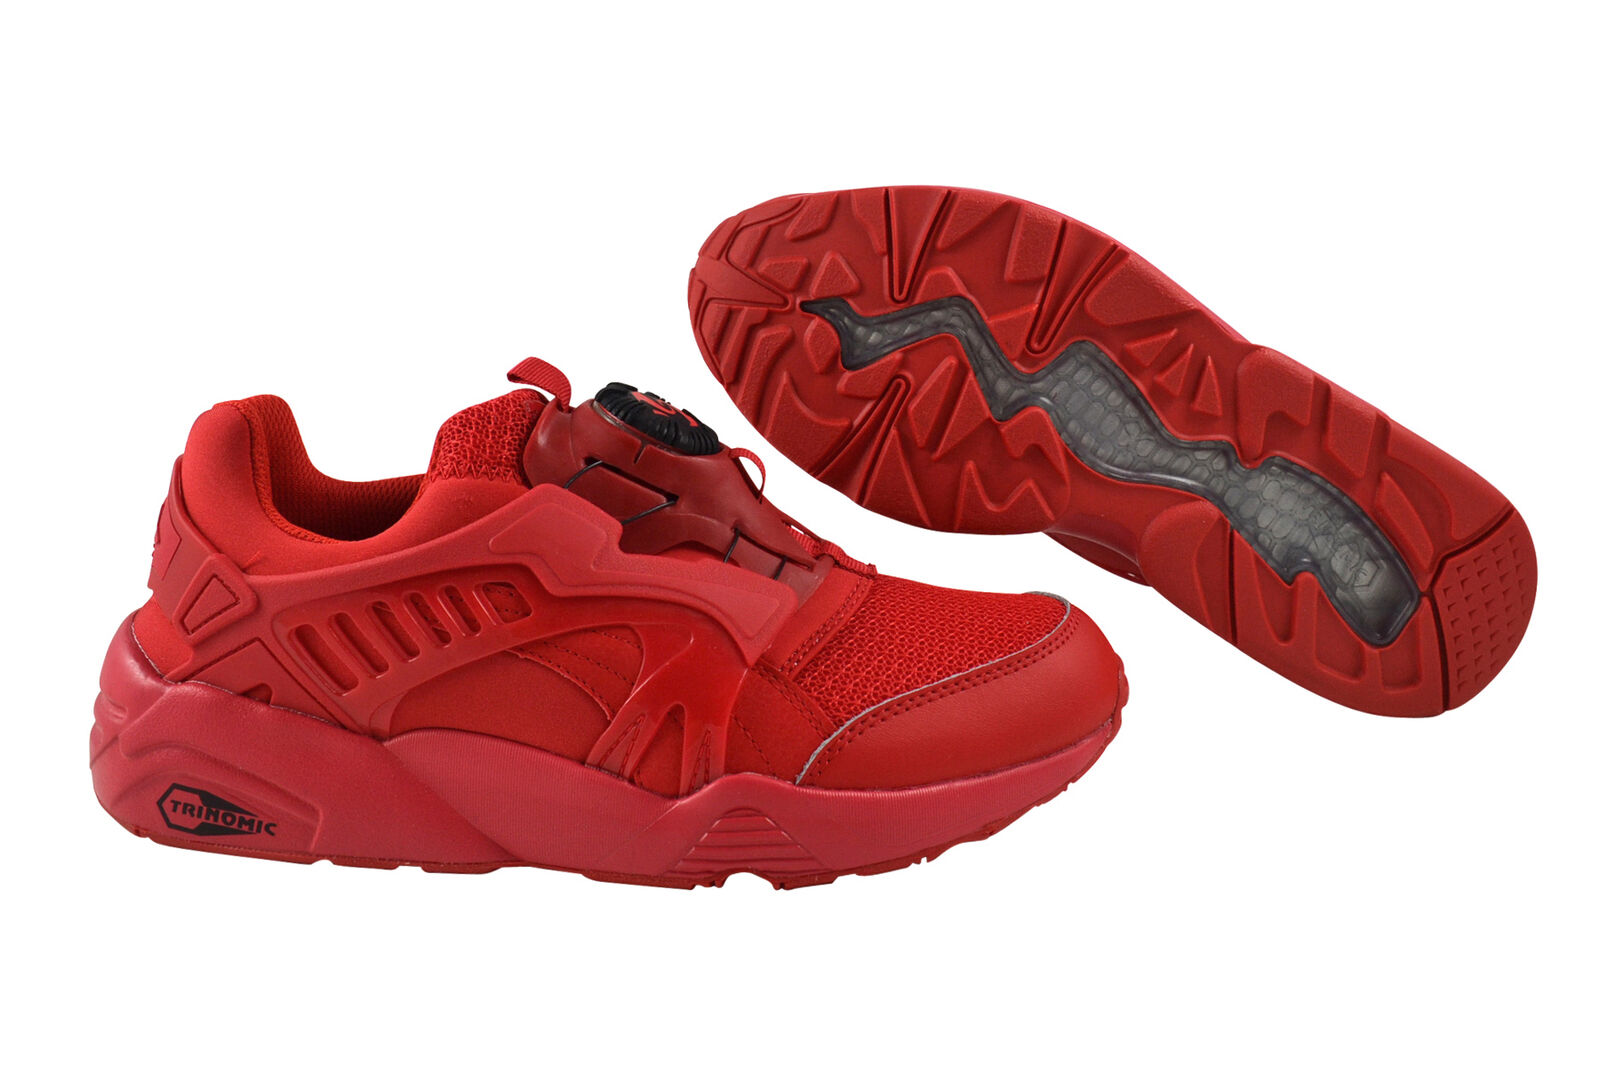 Puma Disc Blaze CT red Sneaker/Schuhe rot 362040 04